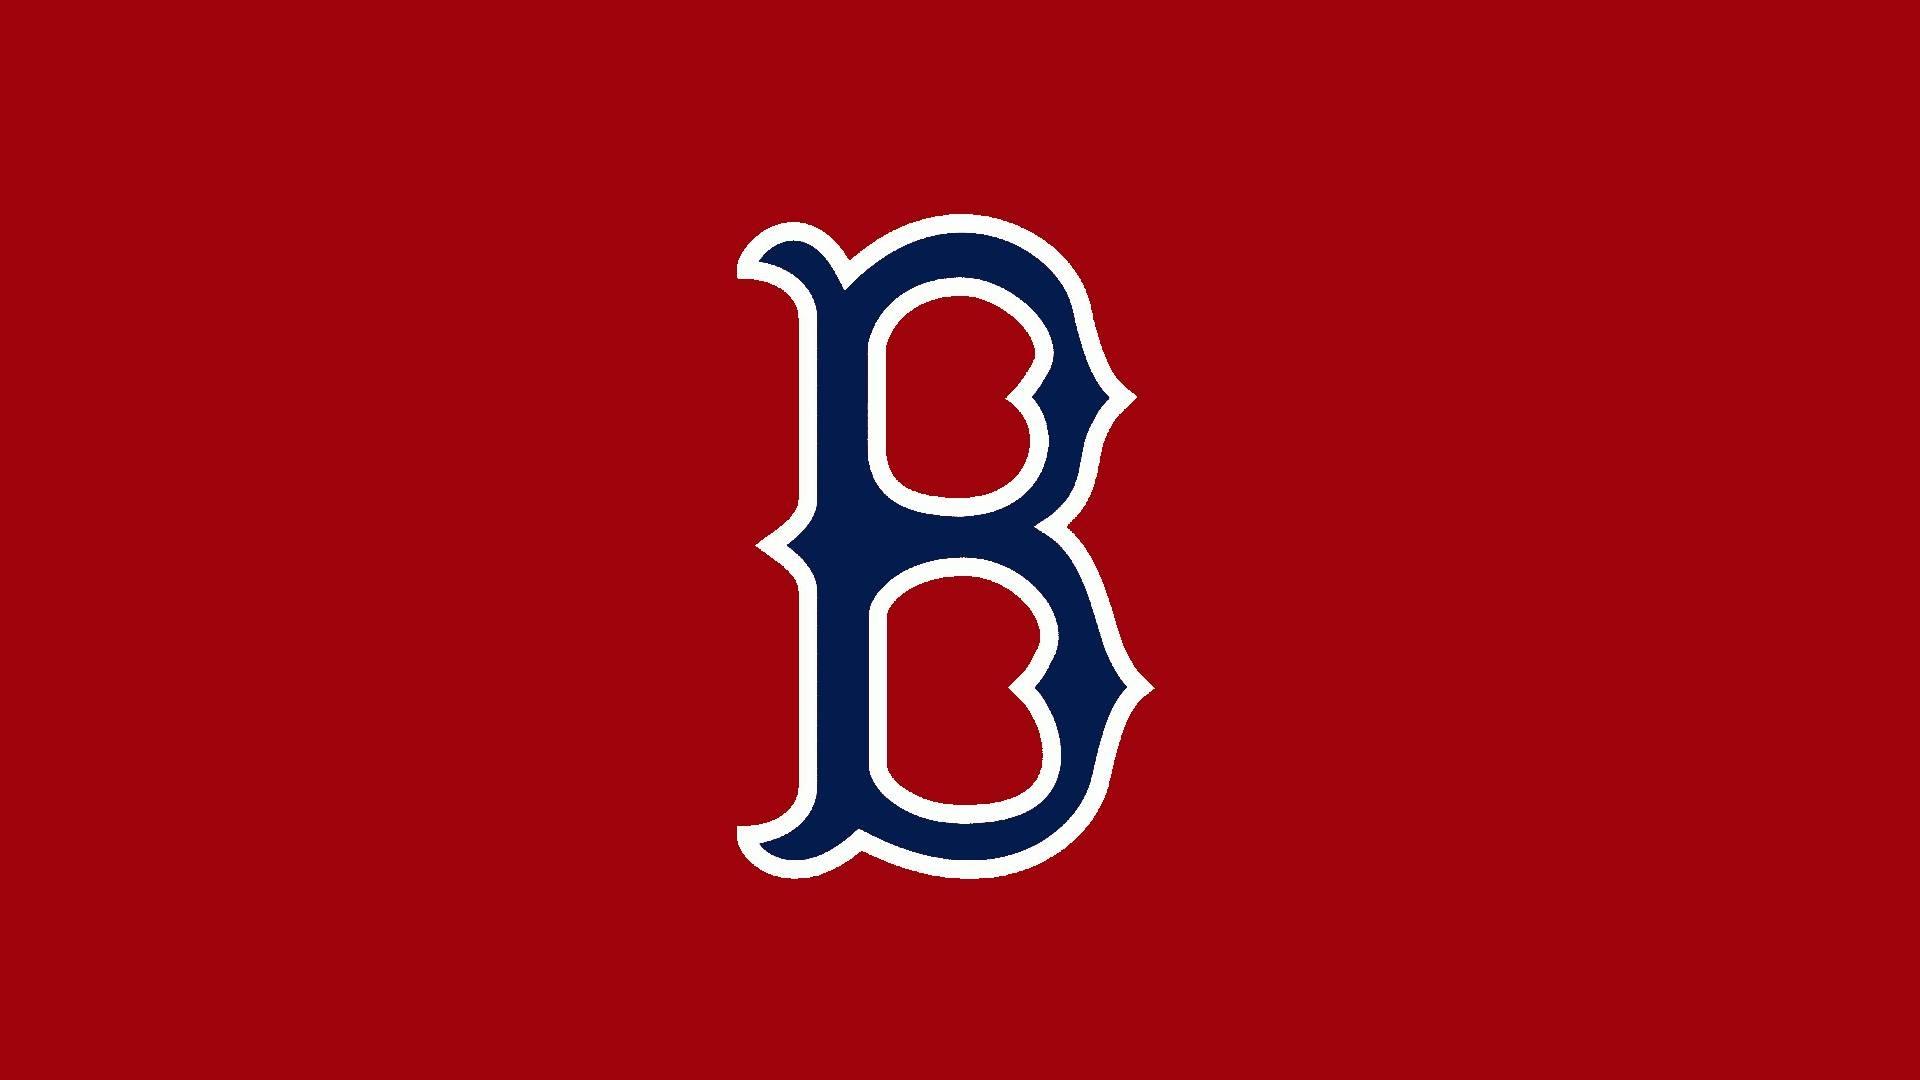 Boston Red Sox Logo Wallpaper | Free Download Clip Art | Free Clip Inside 2017 Boston Red Sox Wall Art (View 13 of 25)